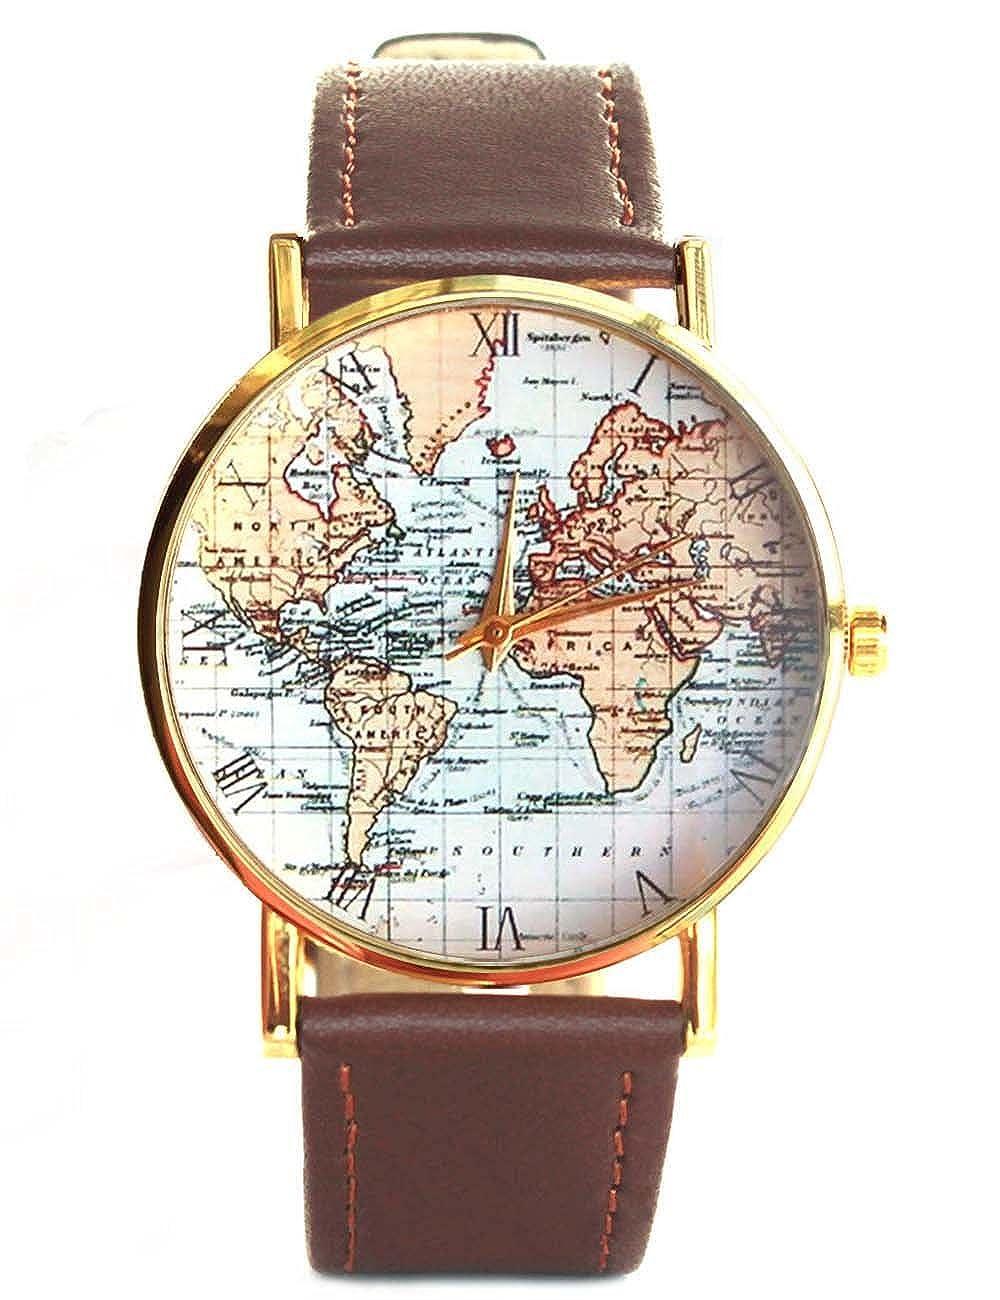 Amazon.com: Ancient Old World Map Original Design Unisex Brown Leather Wrist Watch: Watches